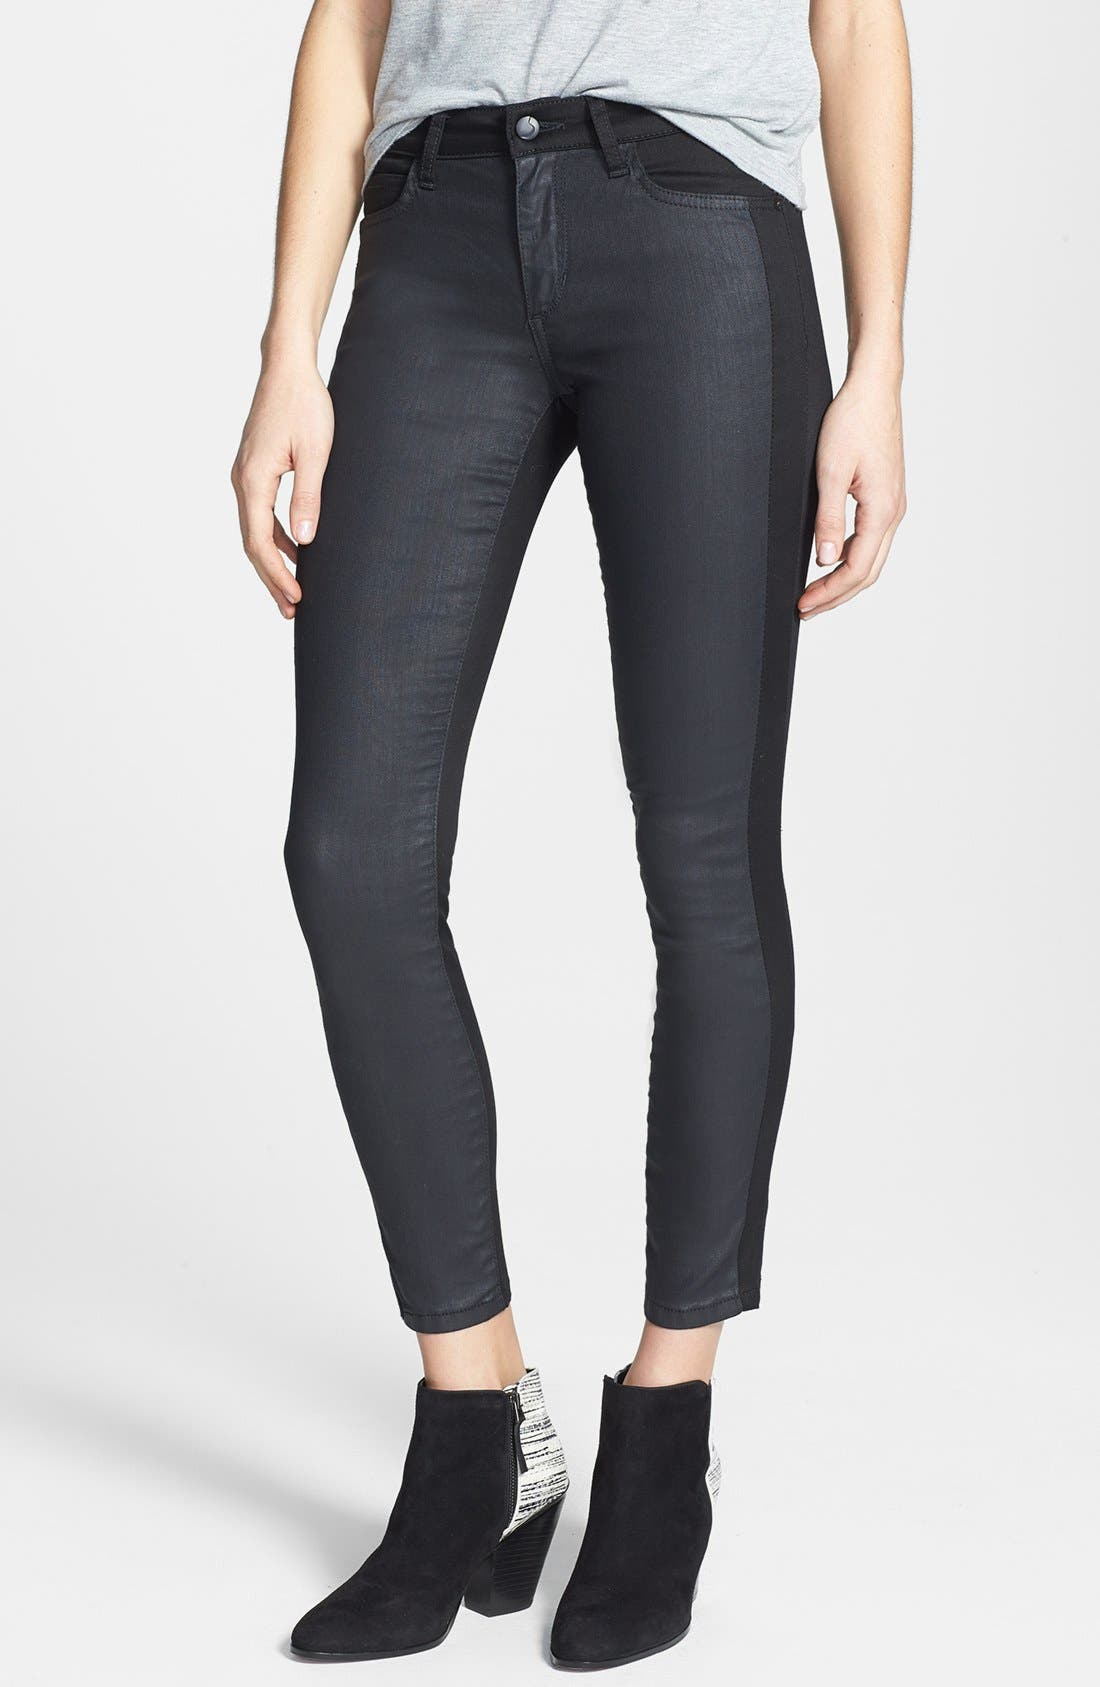 Alternate Image 1 Selected - Joe's 'The Oblique' Contrast Panel Crop Skinny Jeans (Kathy)